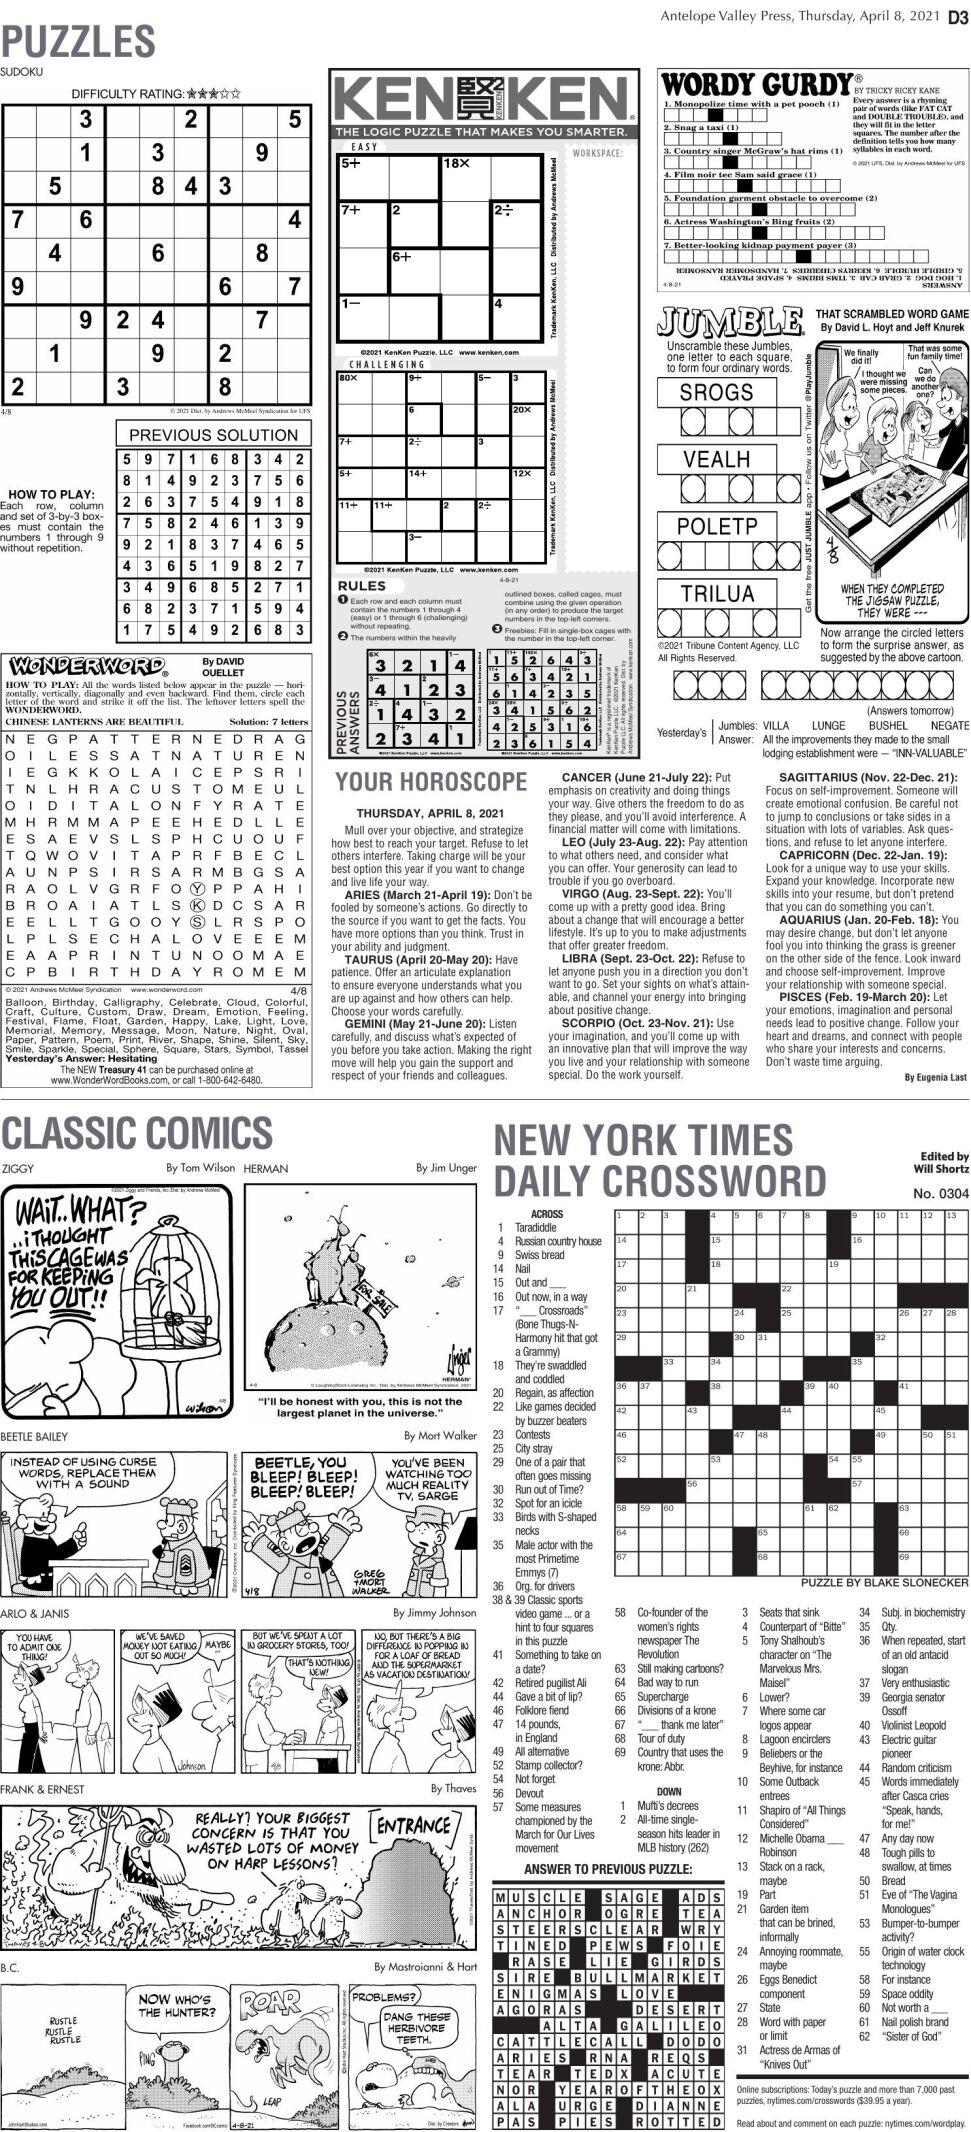 Puzzles, April 8, 2021